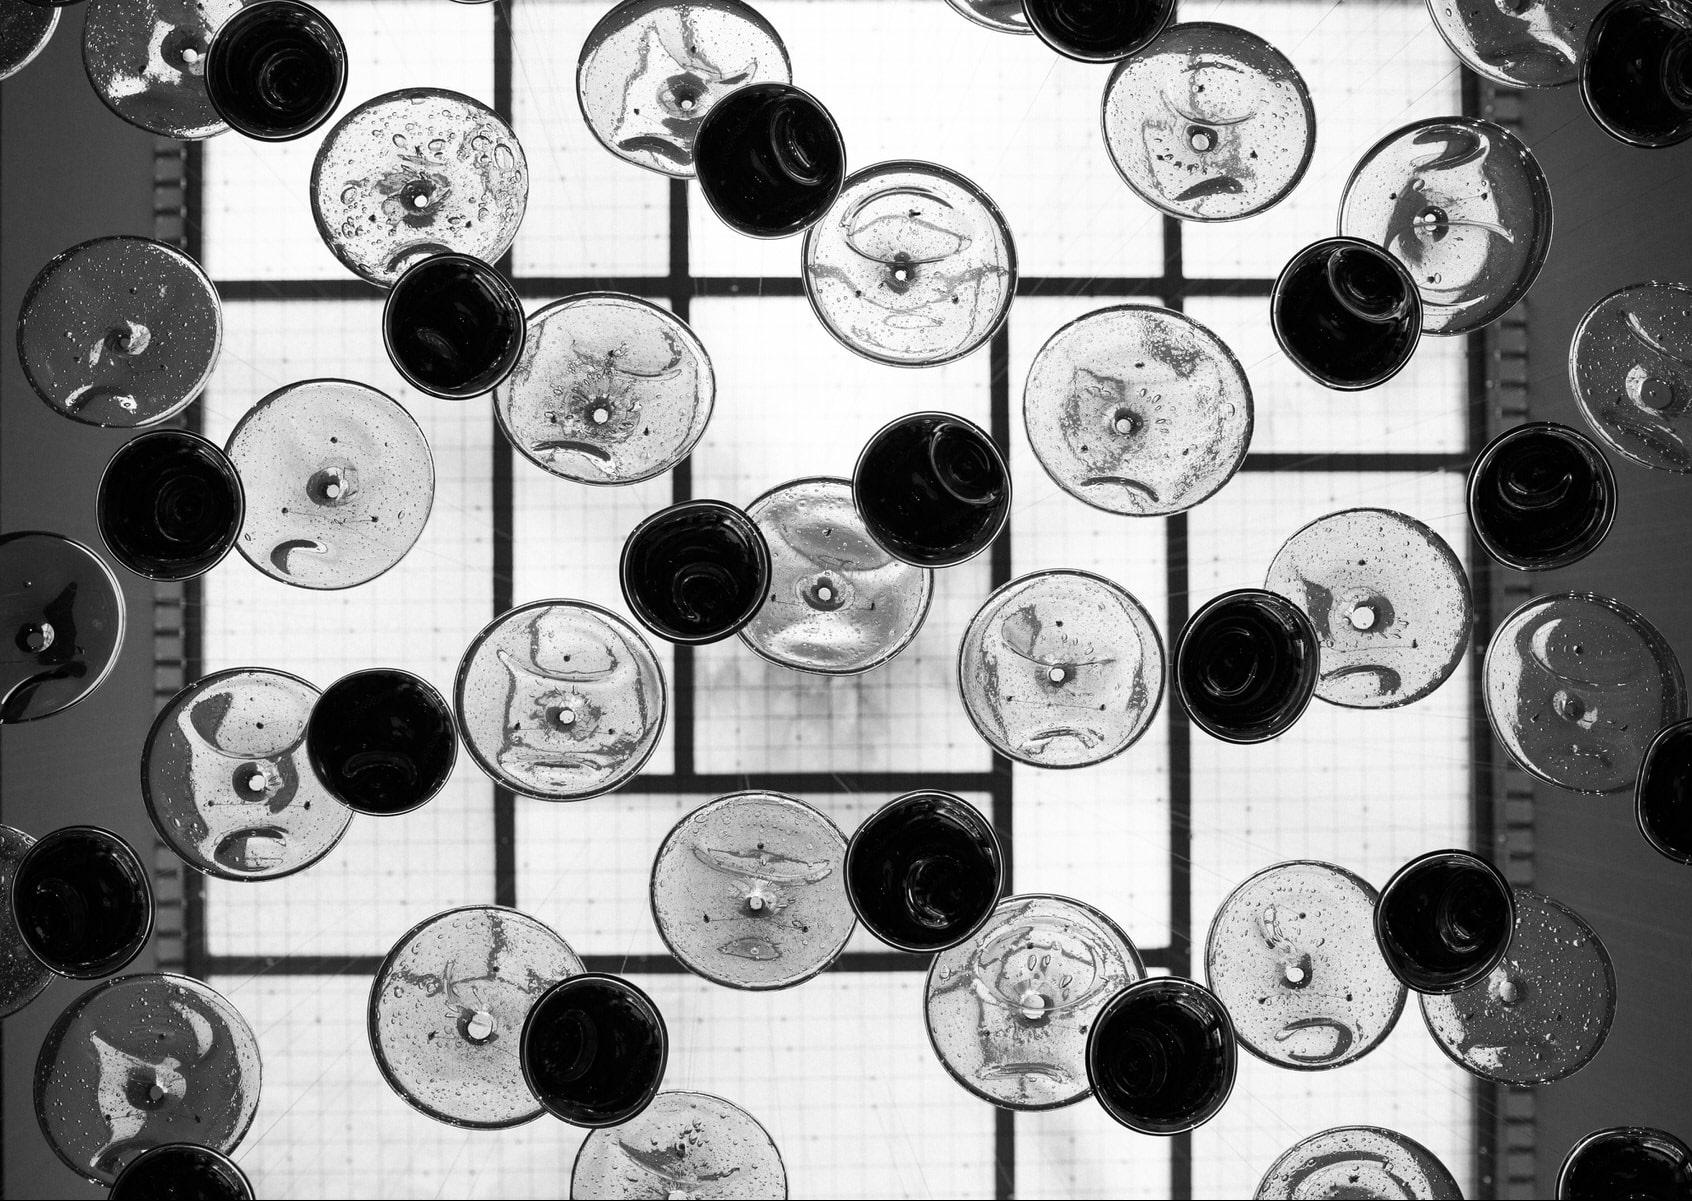 Ritz-Carlton-Chicago-Illinois-black-and-white-fine-art-photography-by-Studio-L-photographer-Laura-Schneider-_5427